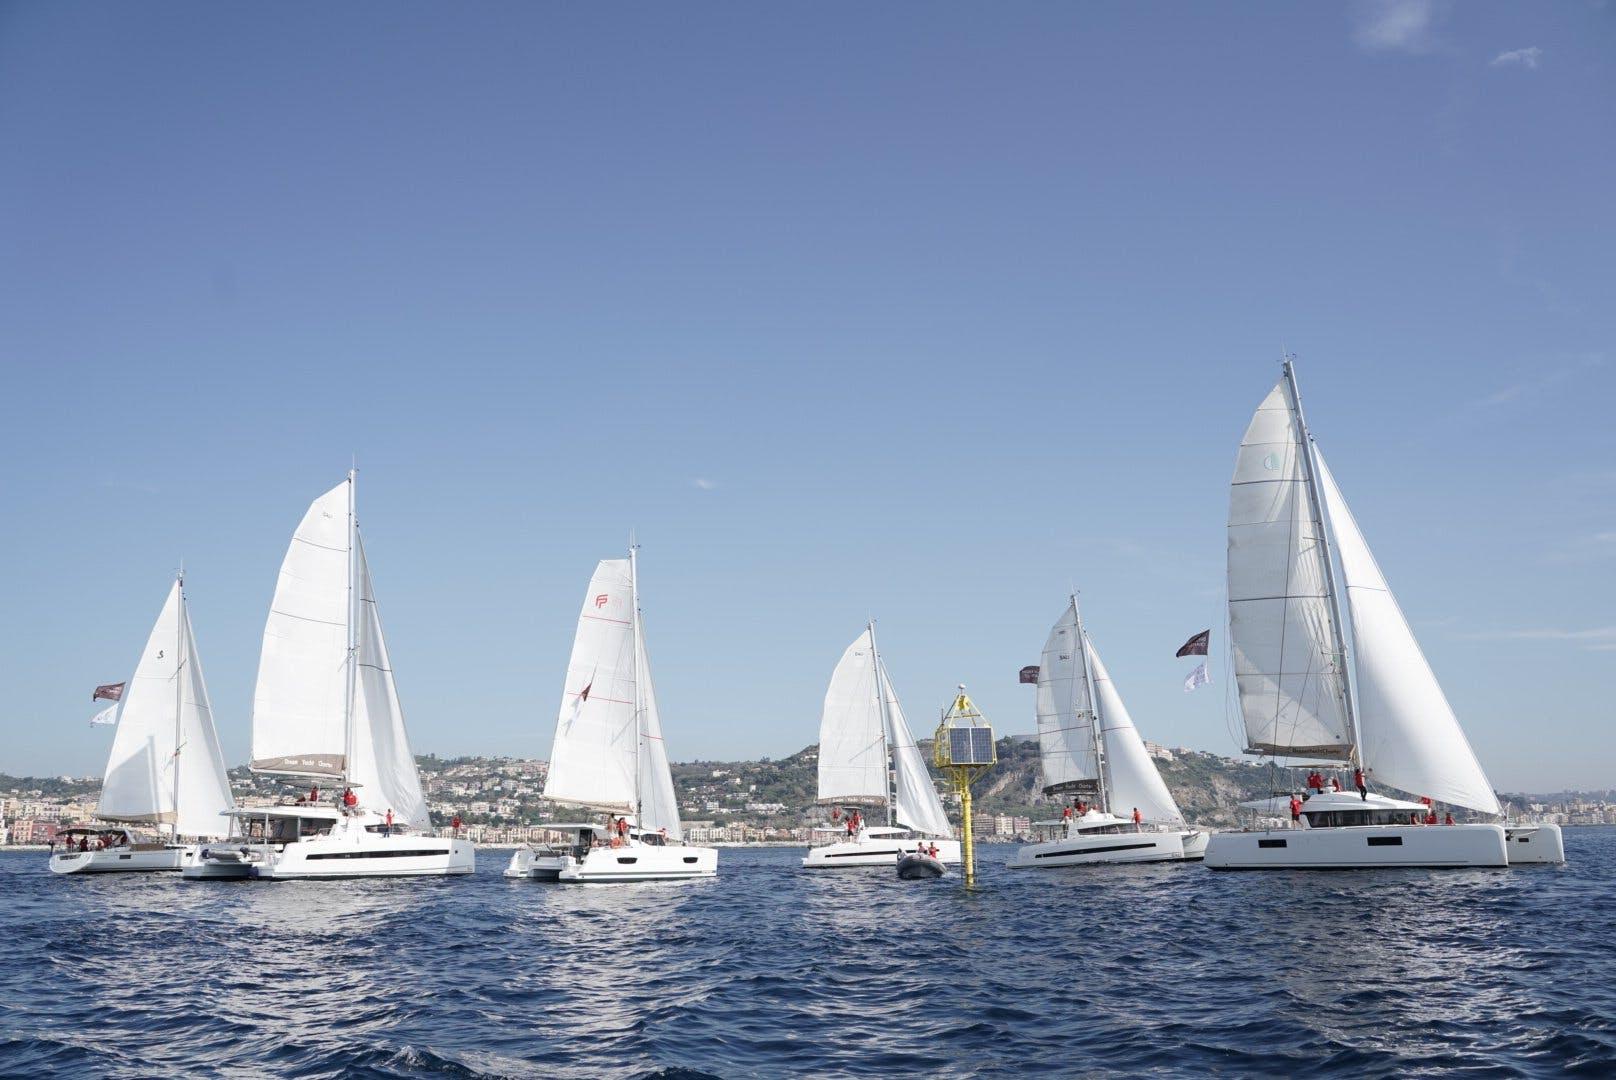 Dream Yacht Charter Owners meeting regatta